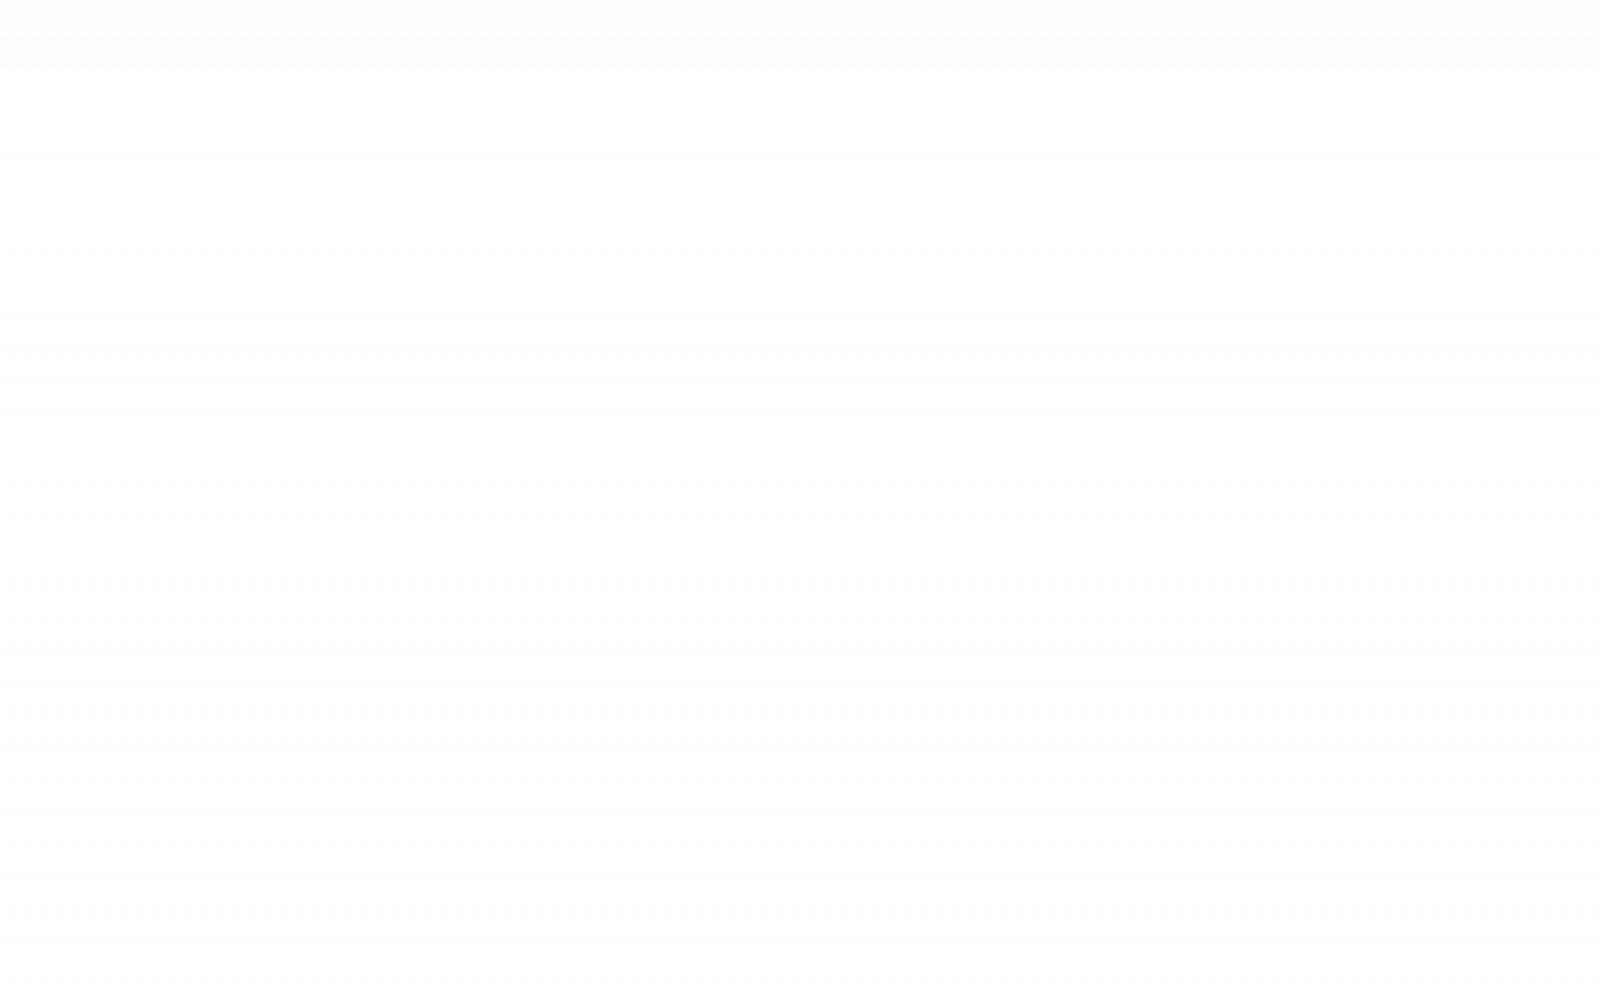 Útiljós svart/kopar